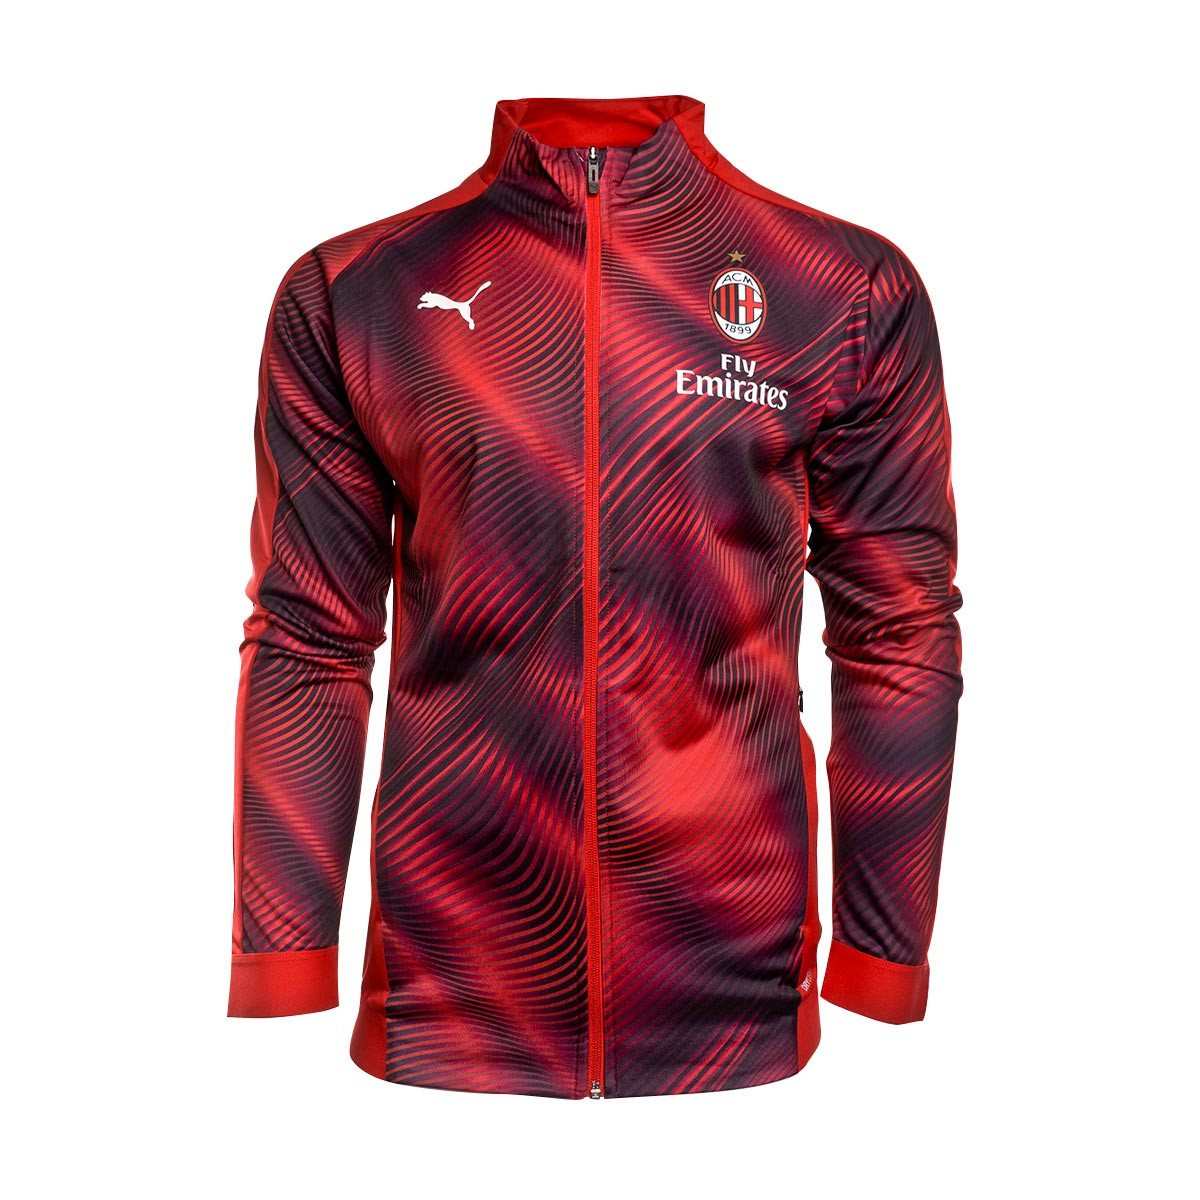 huge selection of 923e0 ee674 Chaqueta AC Milan Stadium 2019-2020 Tango red-Puma black